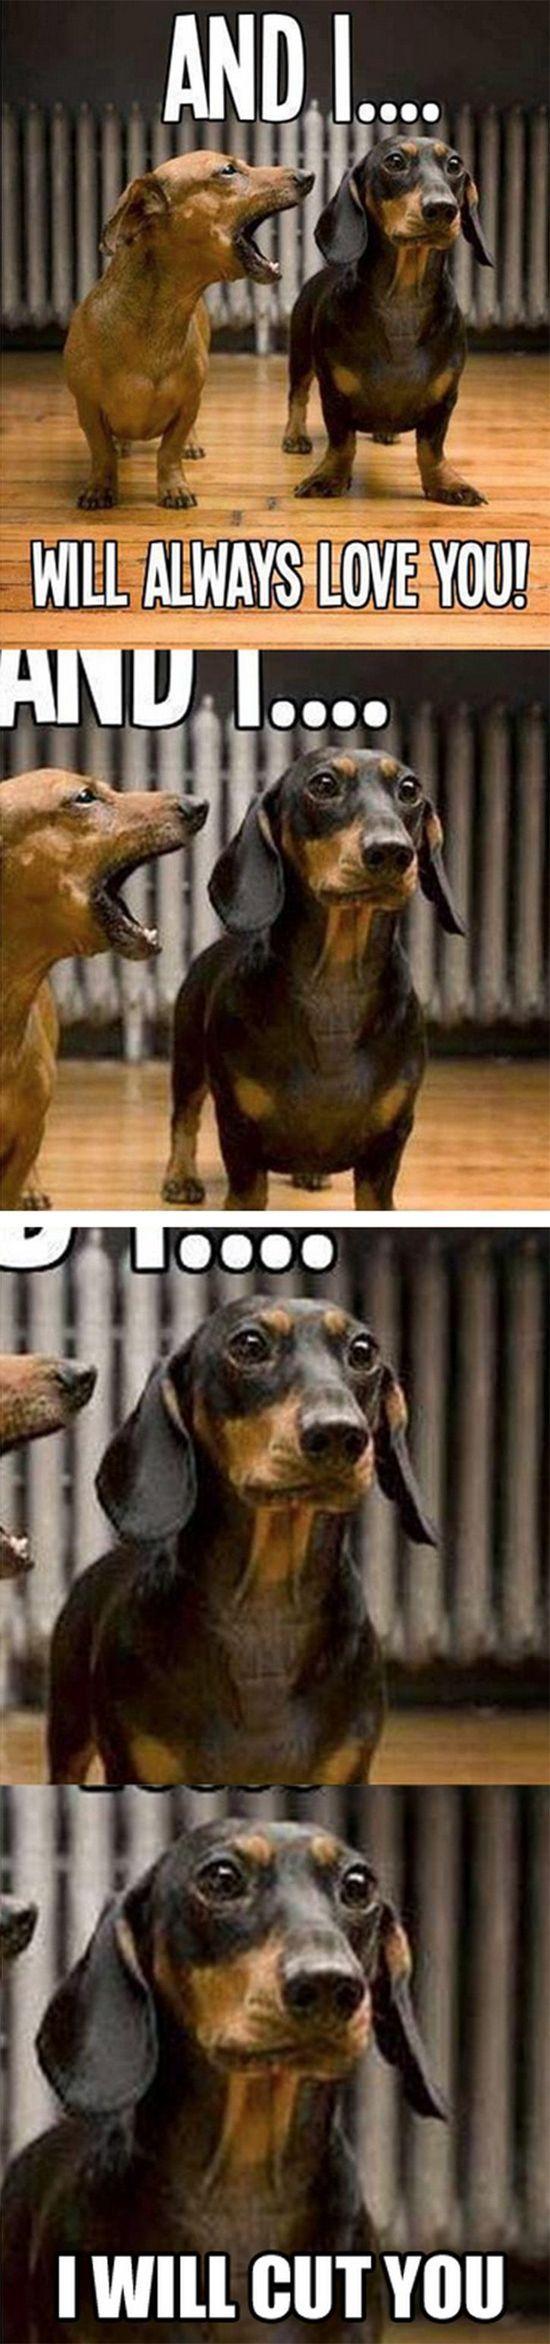 Large Of Dog Joke Meme